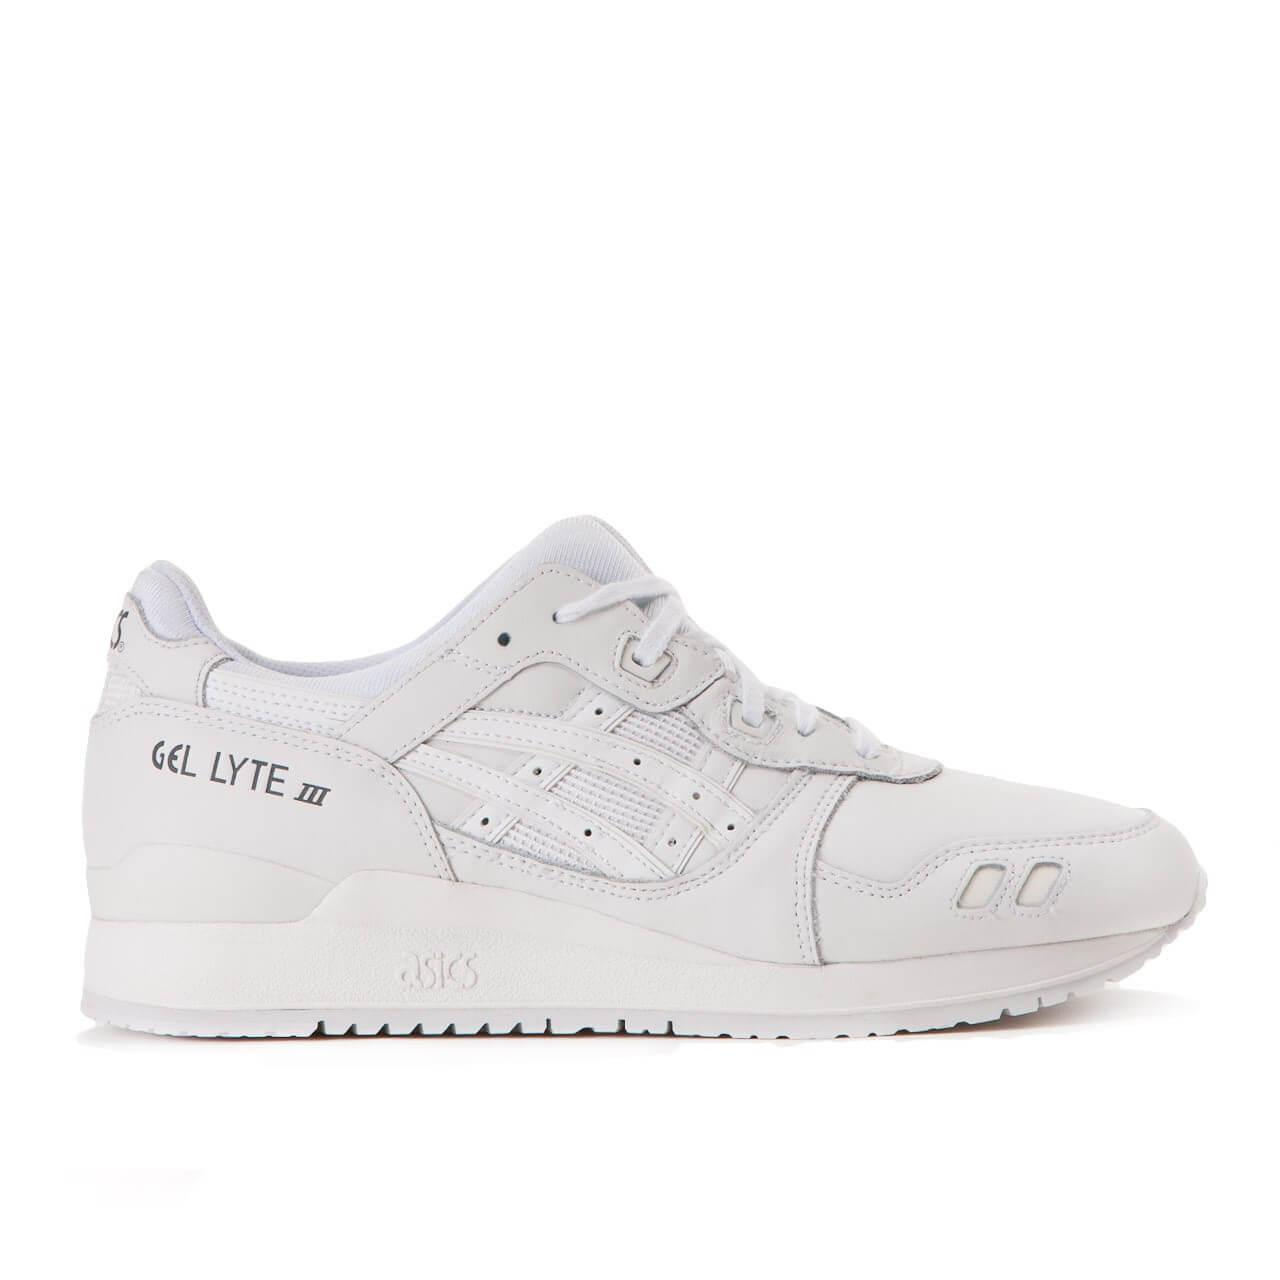 Кроссовки Asics Gel Lyte III Leather All White